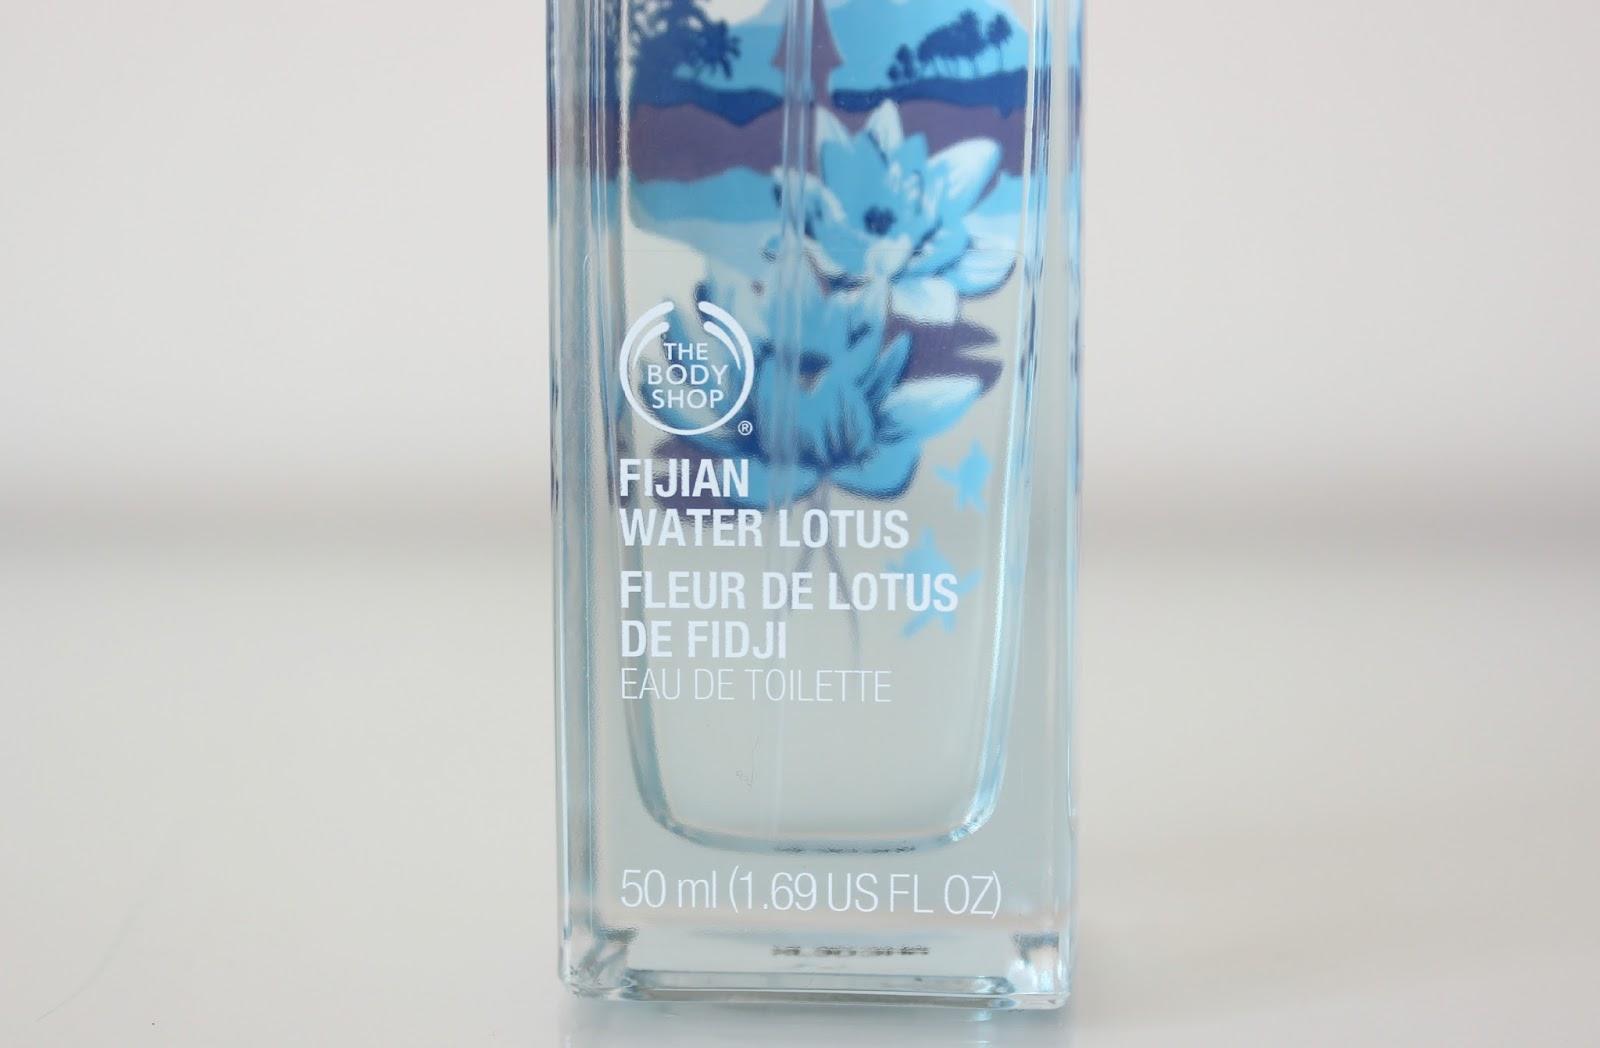 A picture of The Body Shop Fijian Water Lotus Eau de Toilette